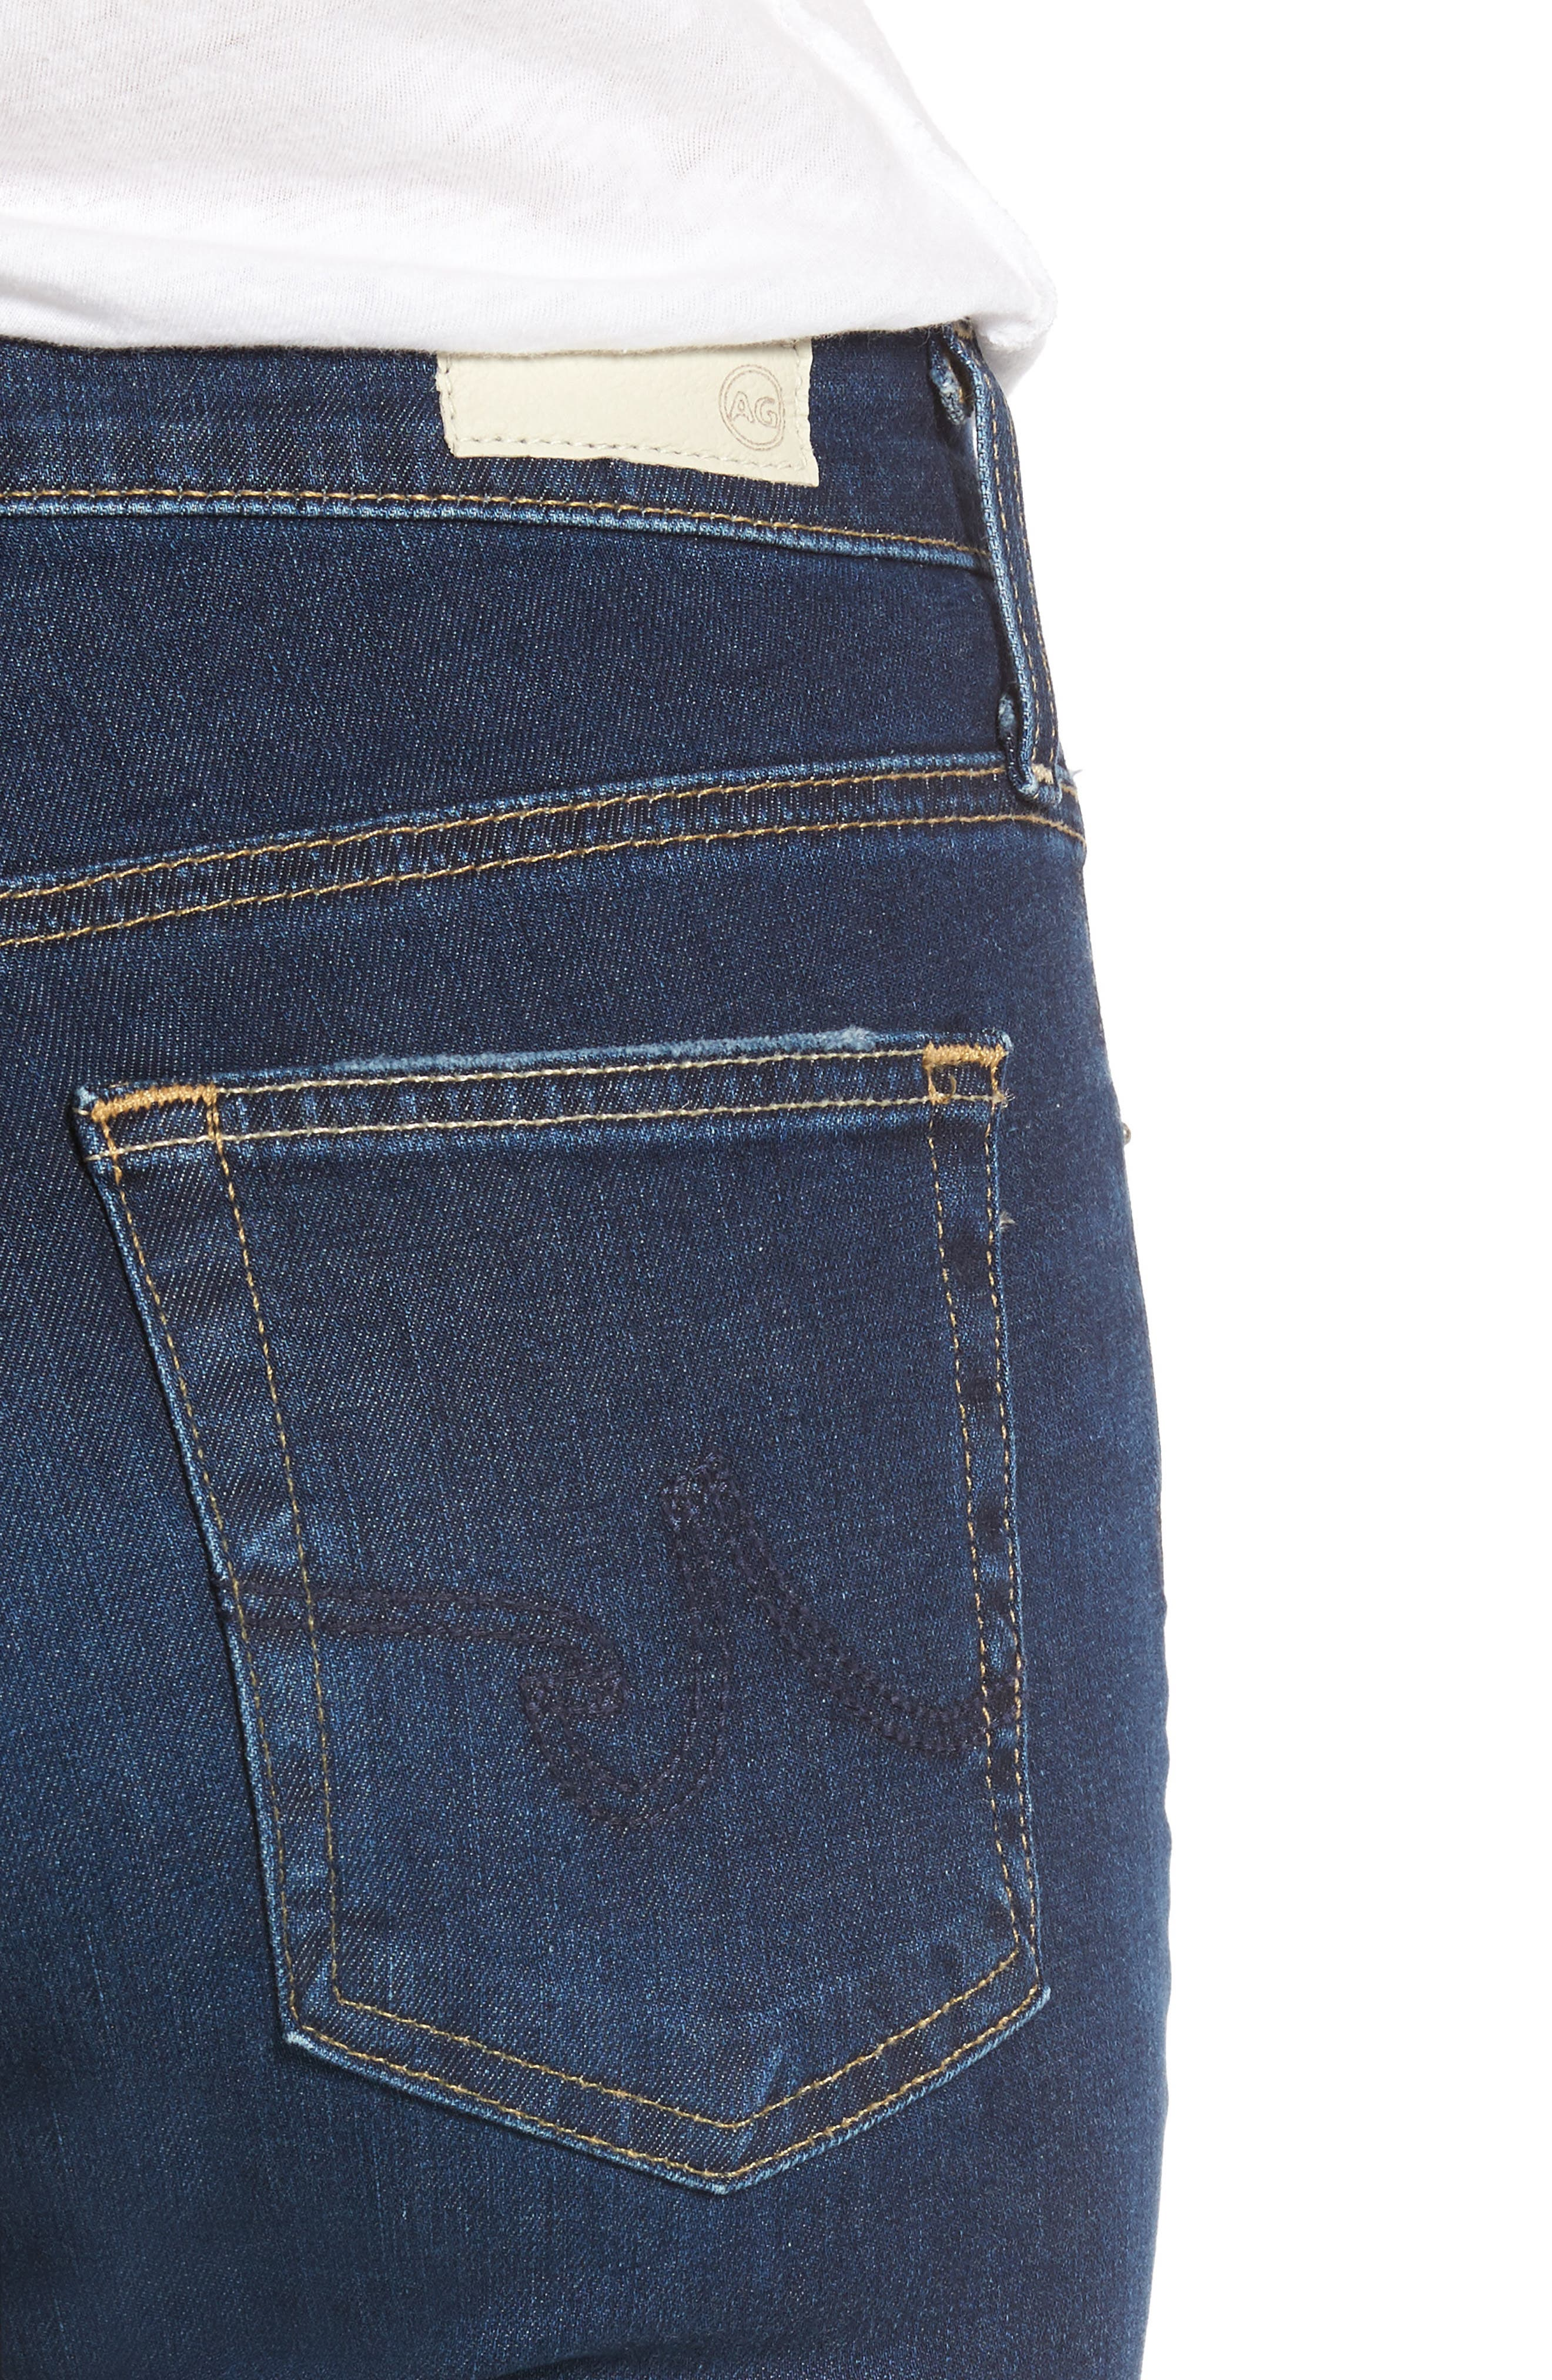 'The Farrah' High Rise Skinny Jeans,                             Alternate thumbnail 36, color,